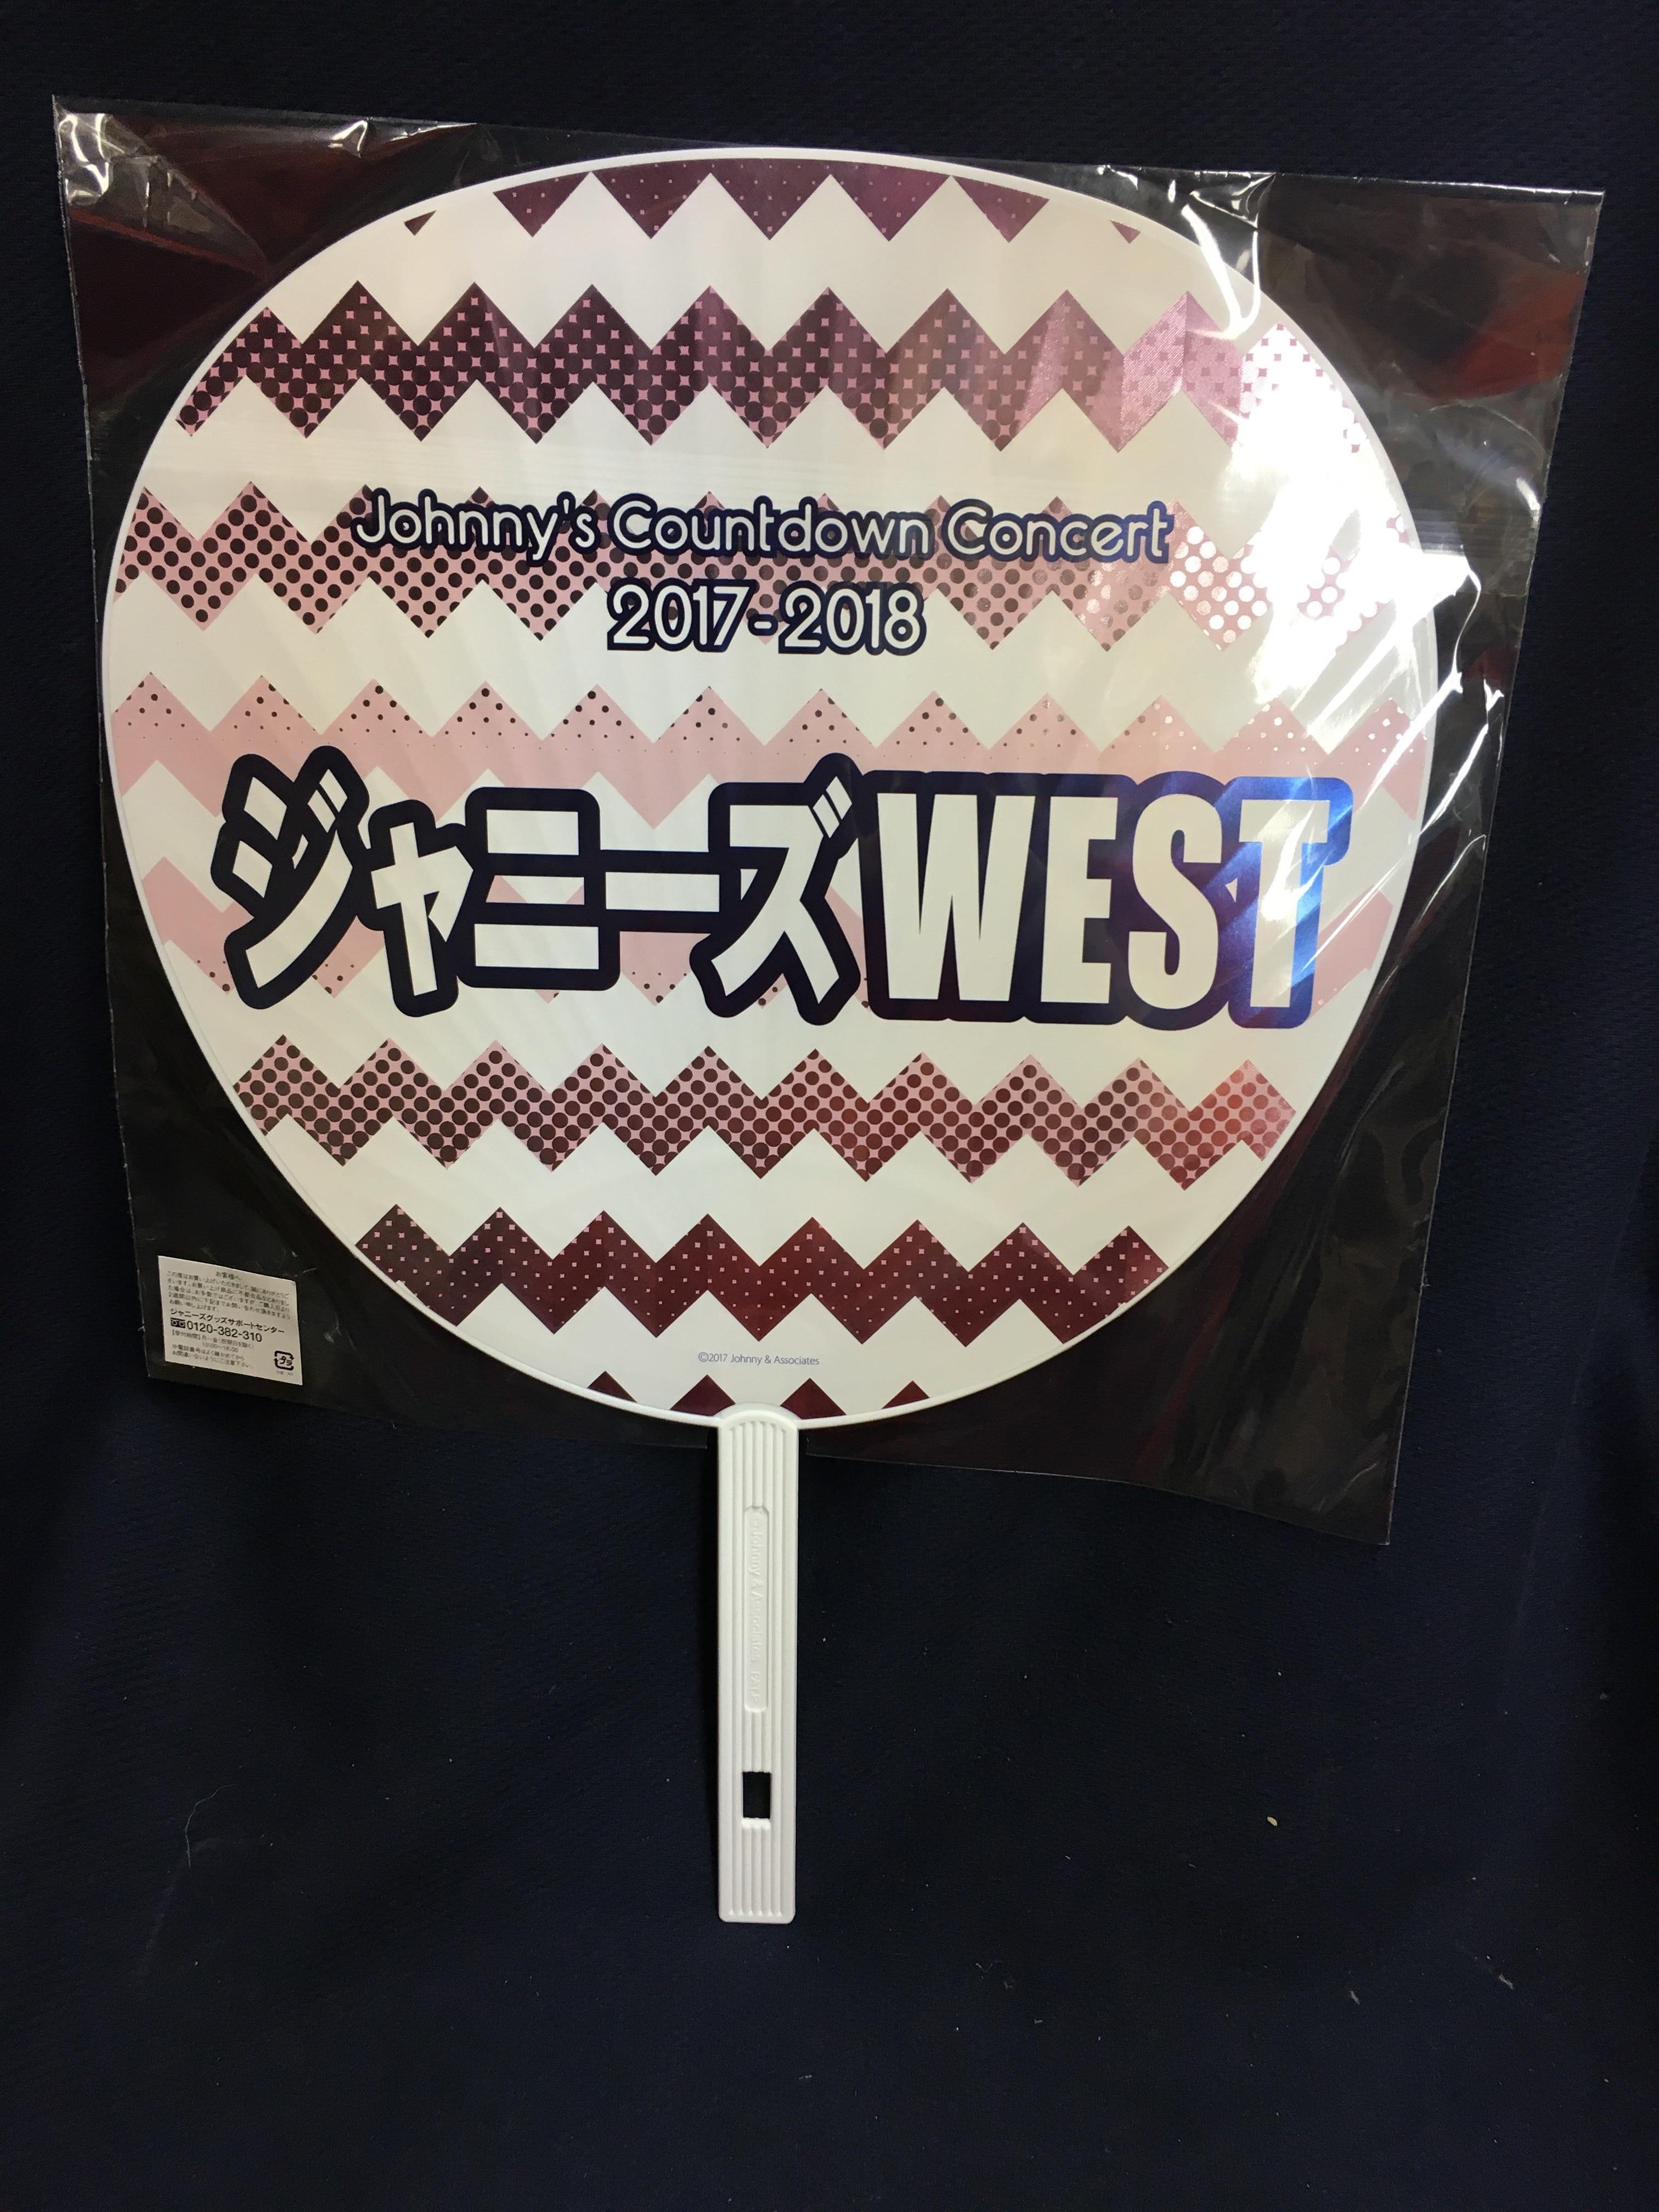 West 小説 ジャニーズ bl